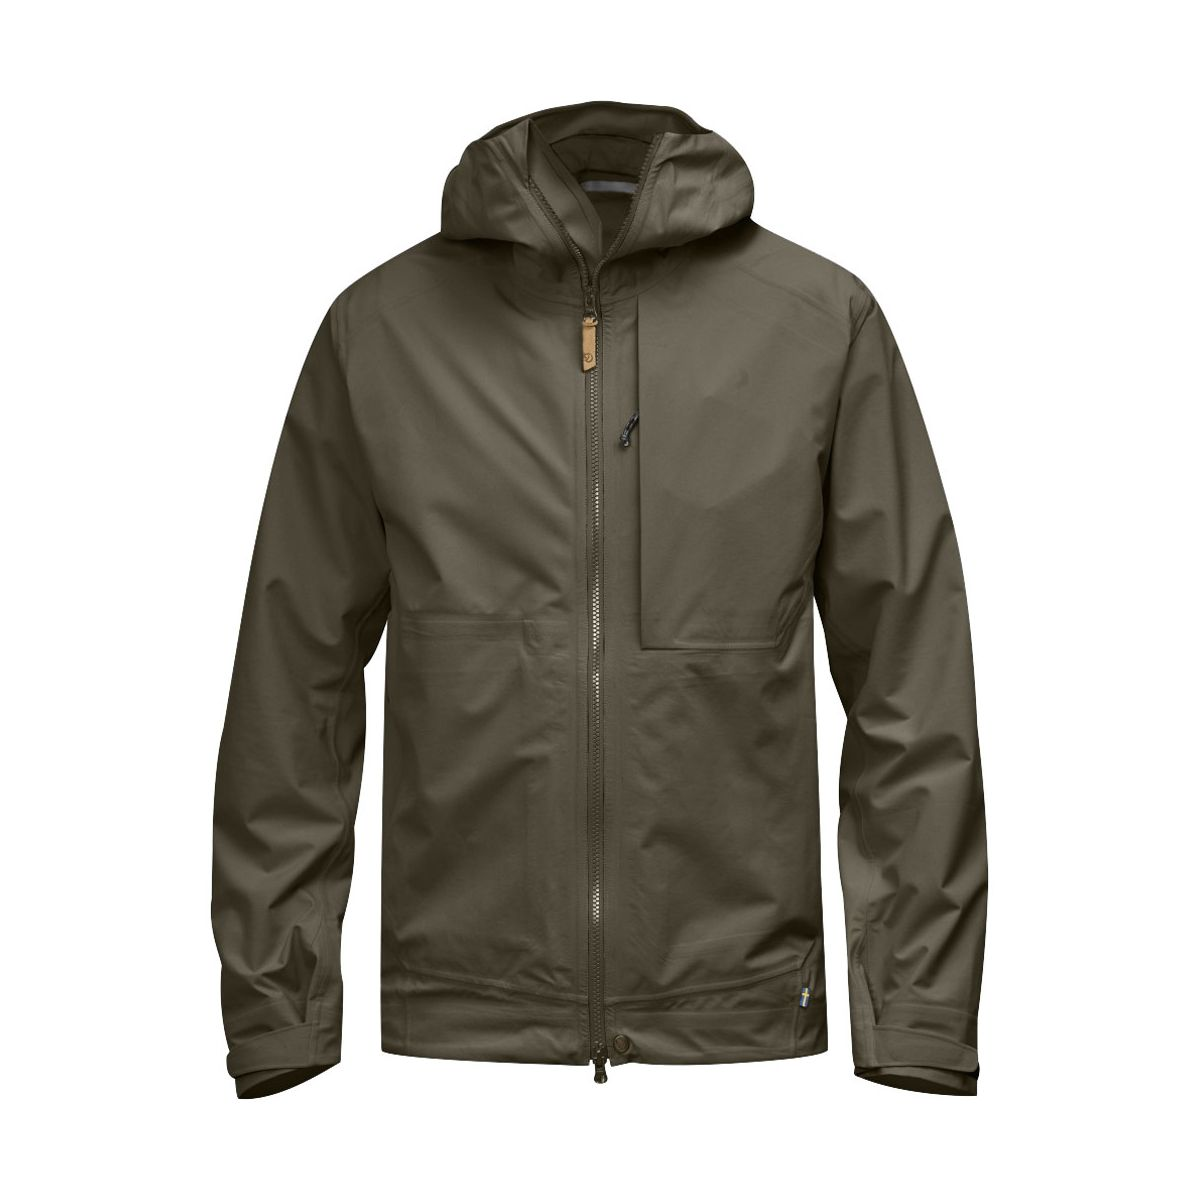 Fjallraven Abisko Eco-Shell Jacket - Men